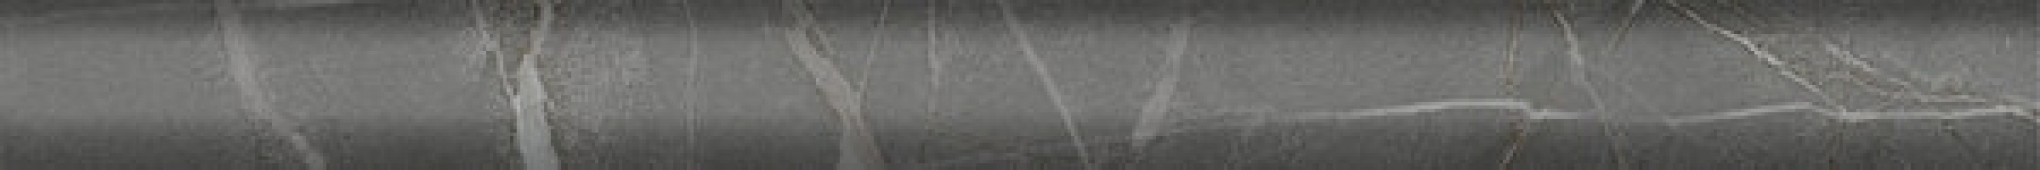 SPA045R Буонарроти серый темный обрезной 30*2.5 бордюр